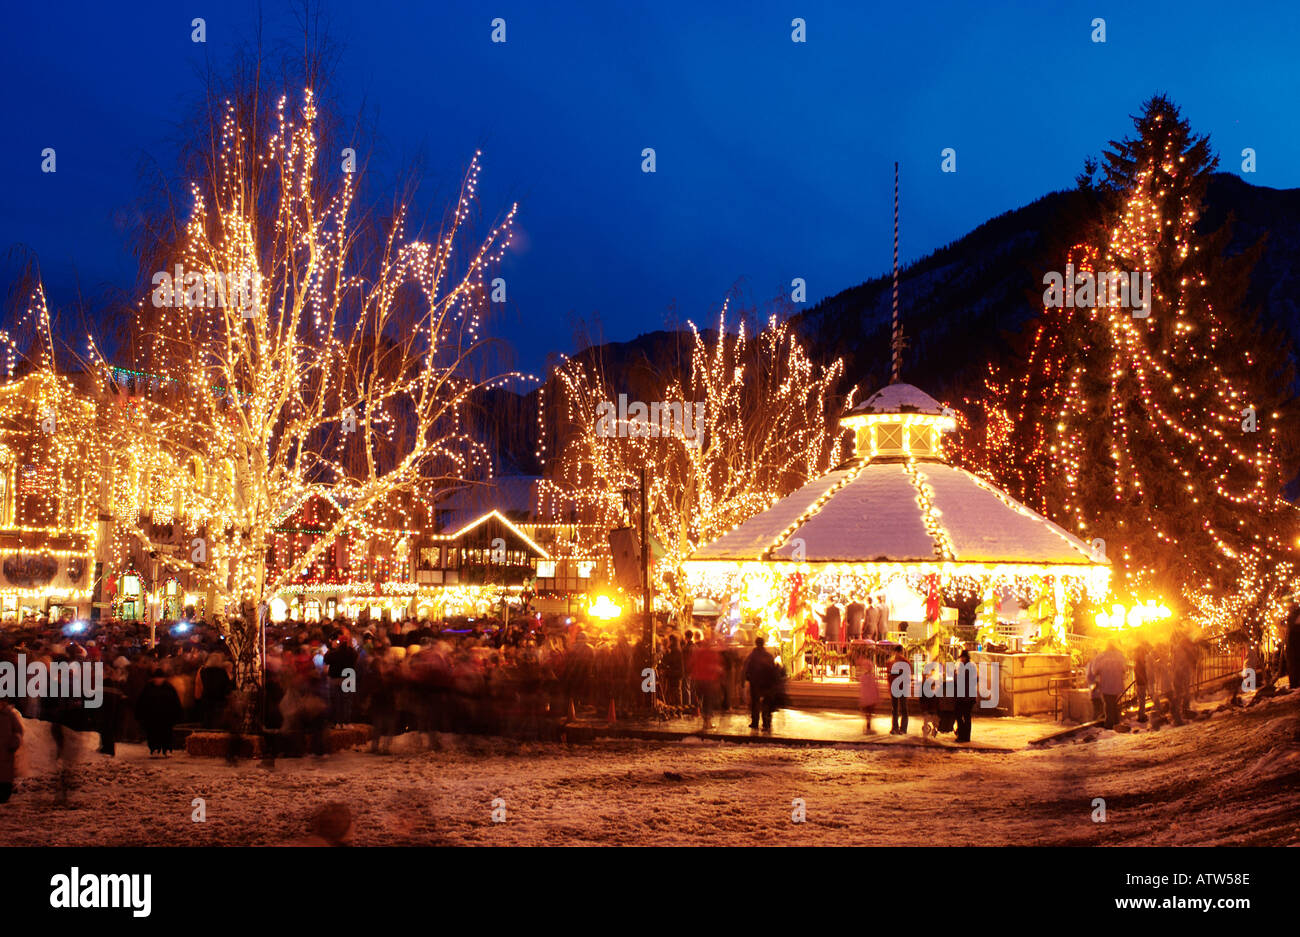 Leavenworth Washington Christmas 2019.Leavenworth Washington Christmas Lights At Night Stock Photo